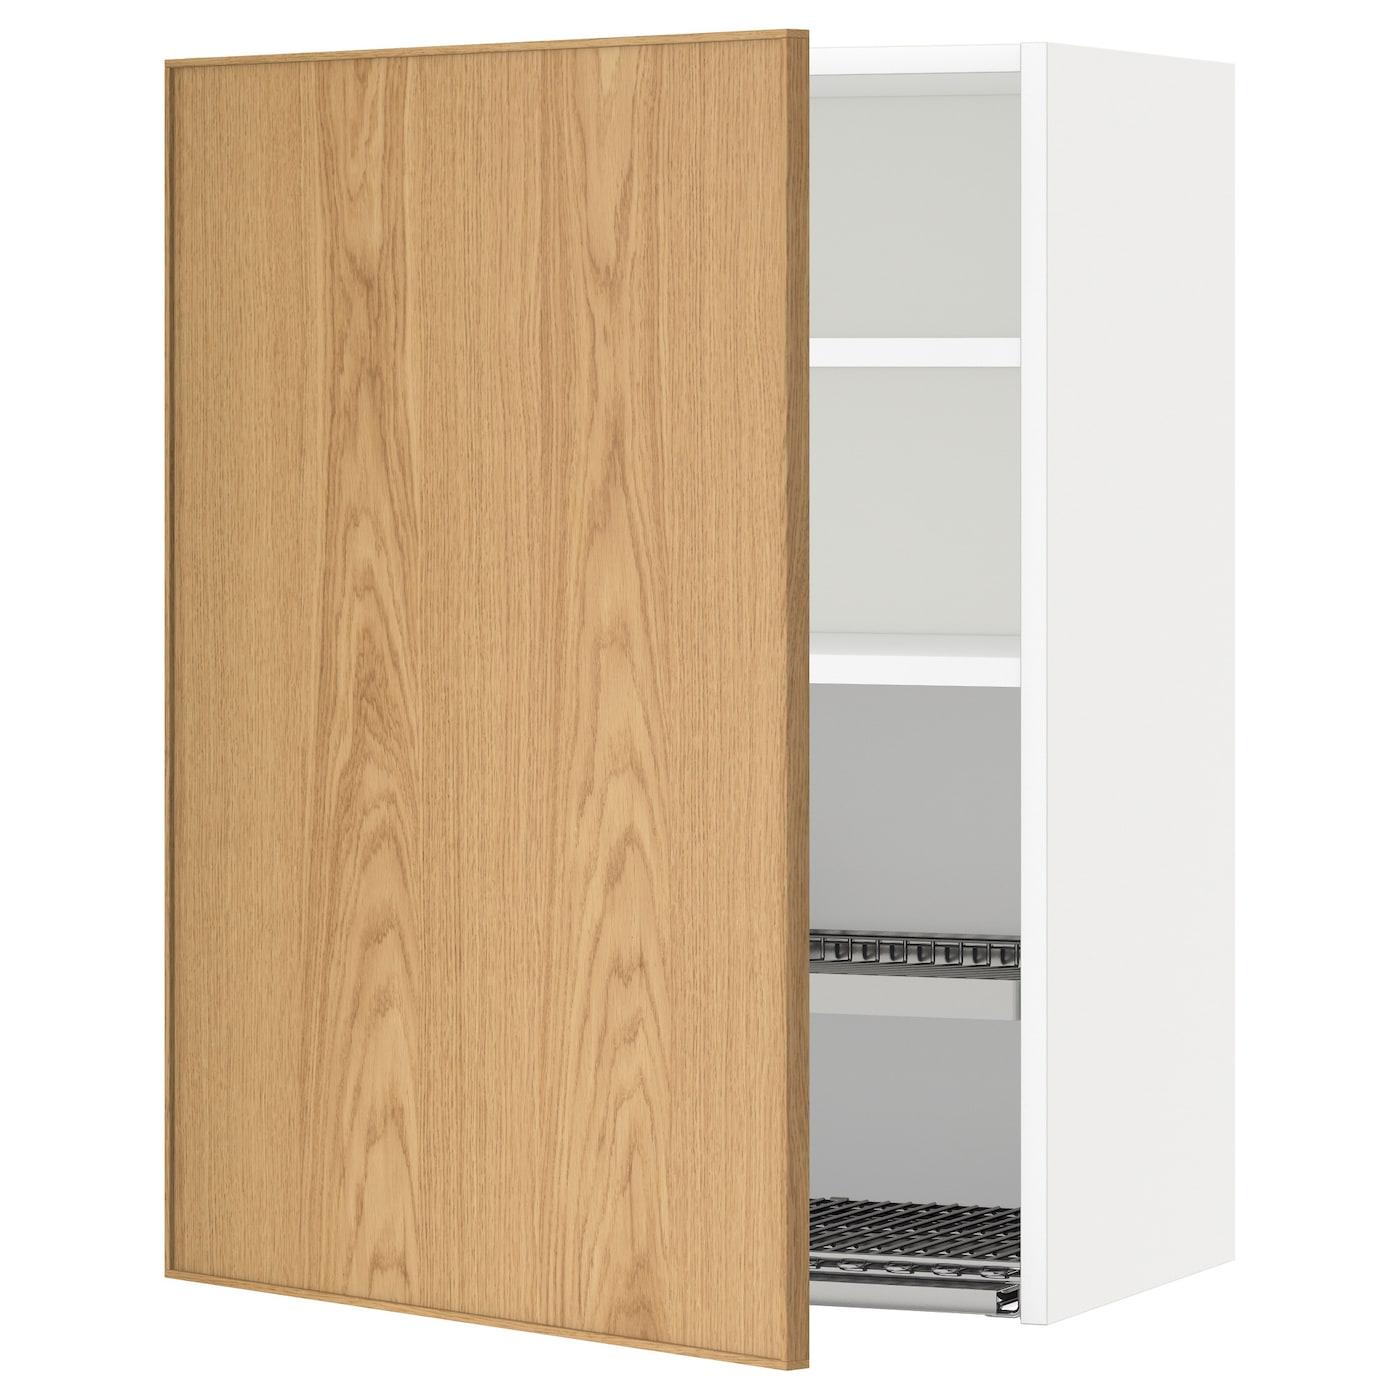 Metod wall cabinet with dish drainer white ekestad oak - Ikea wall cabinets ...